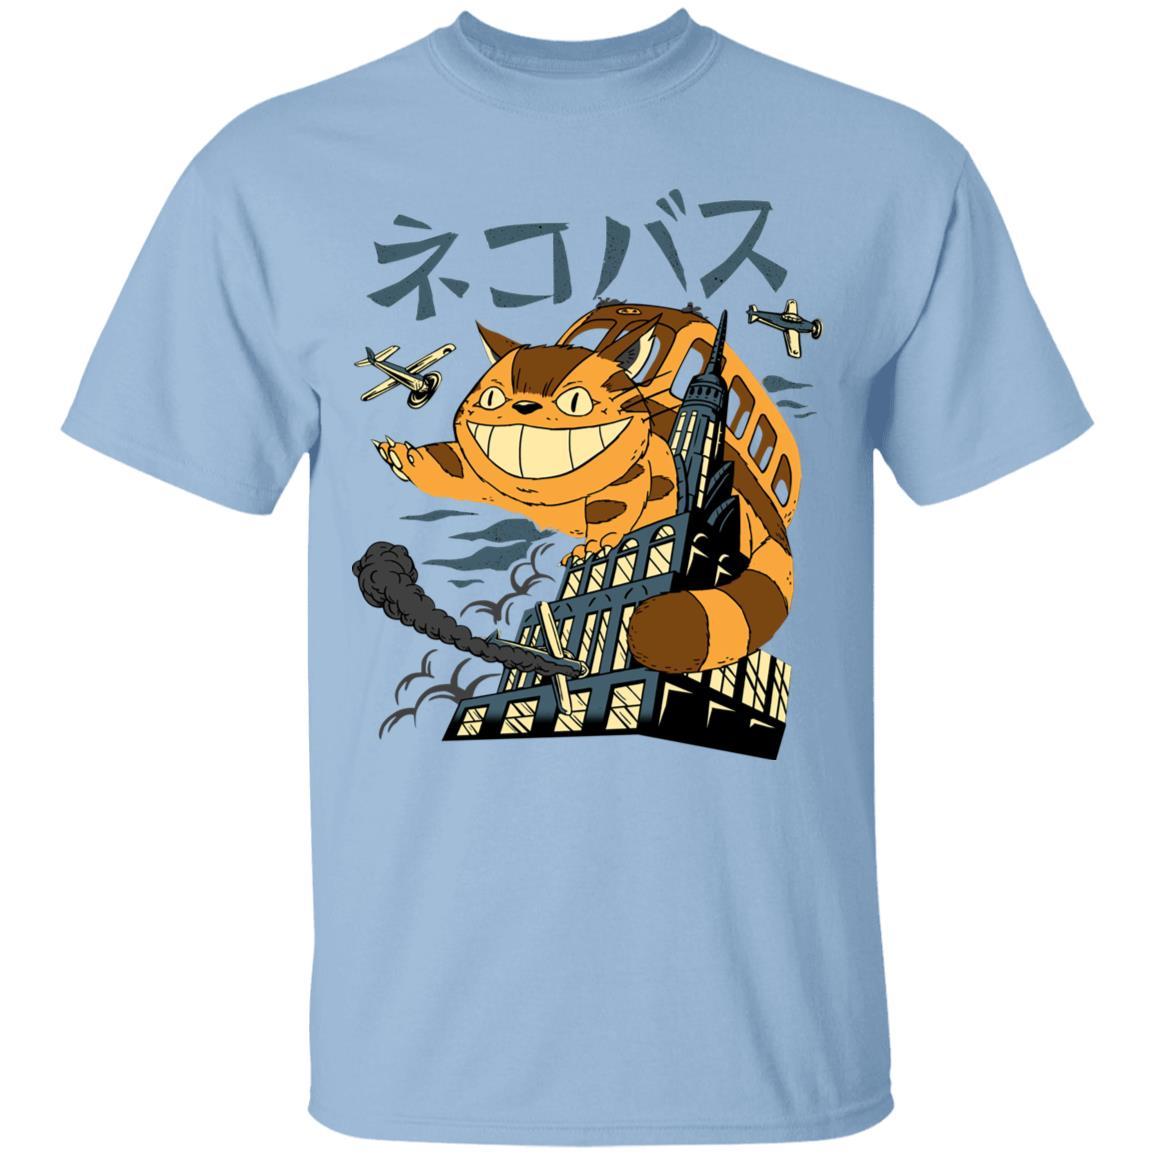 The Cat Bus Kong T Shirt